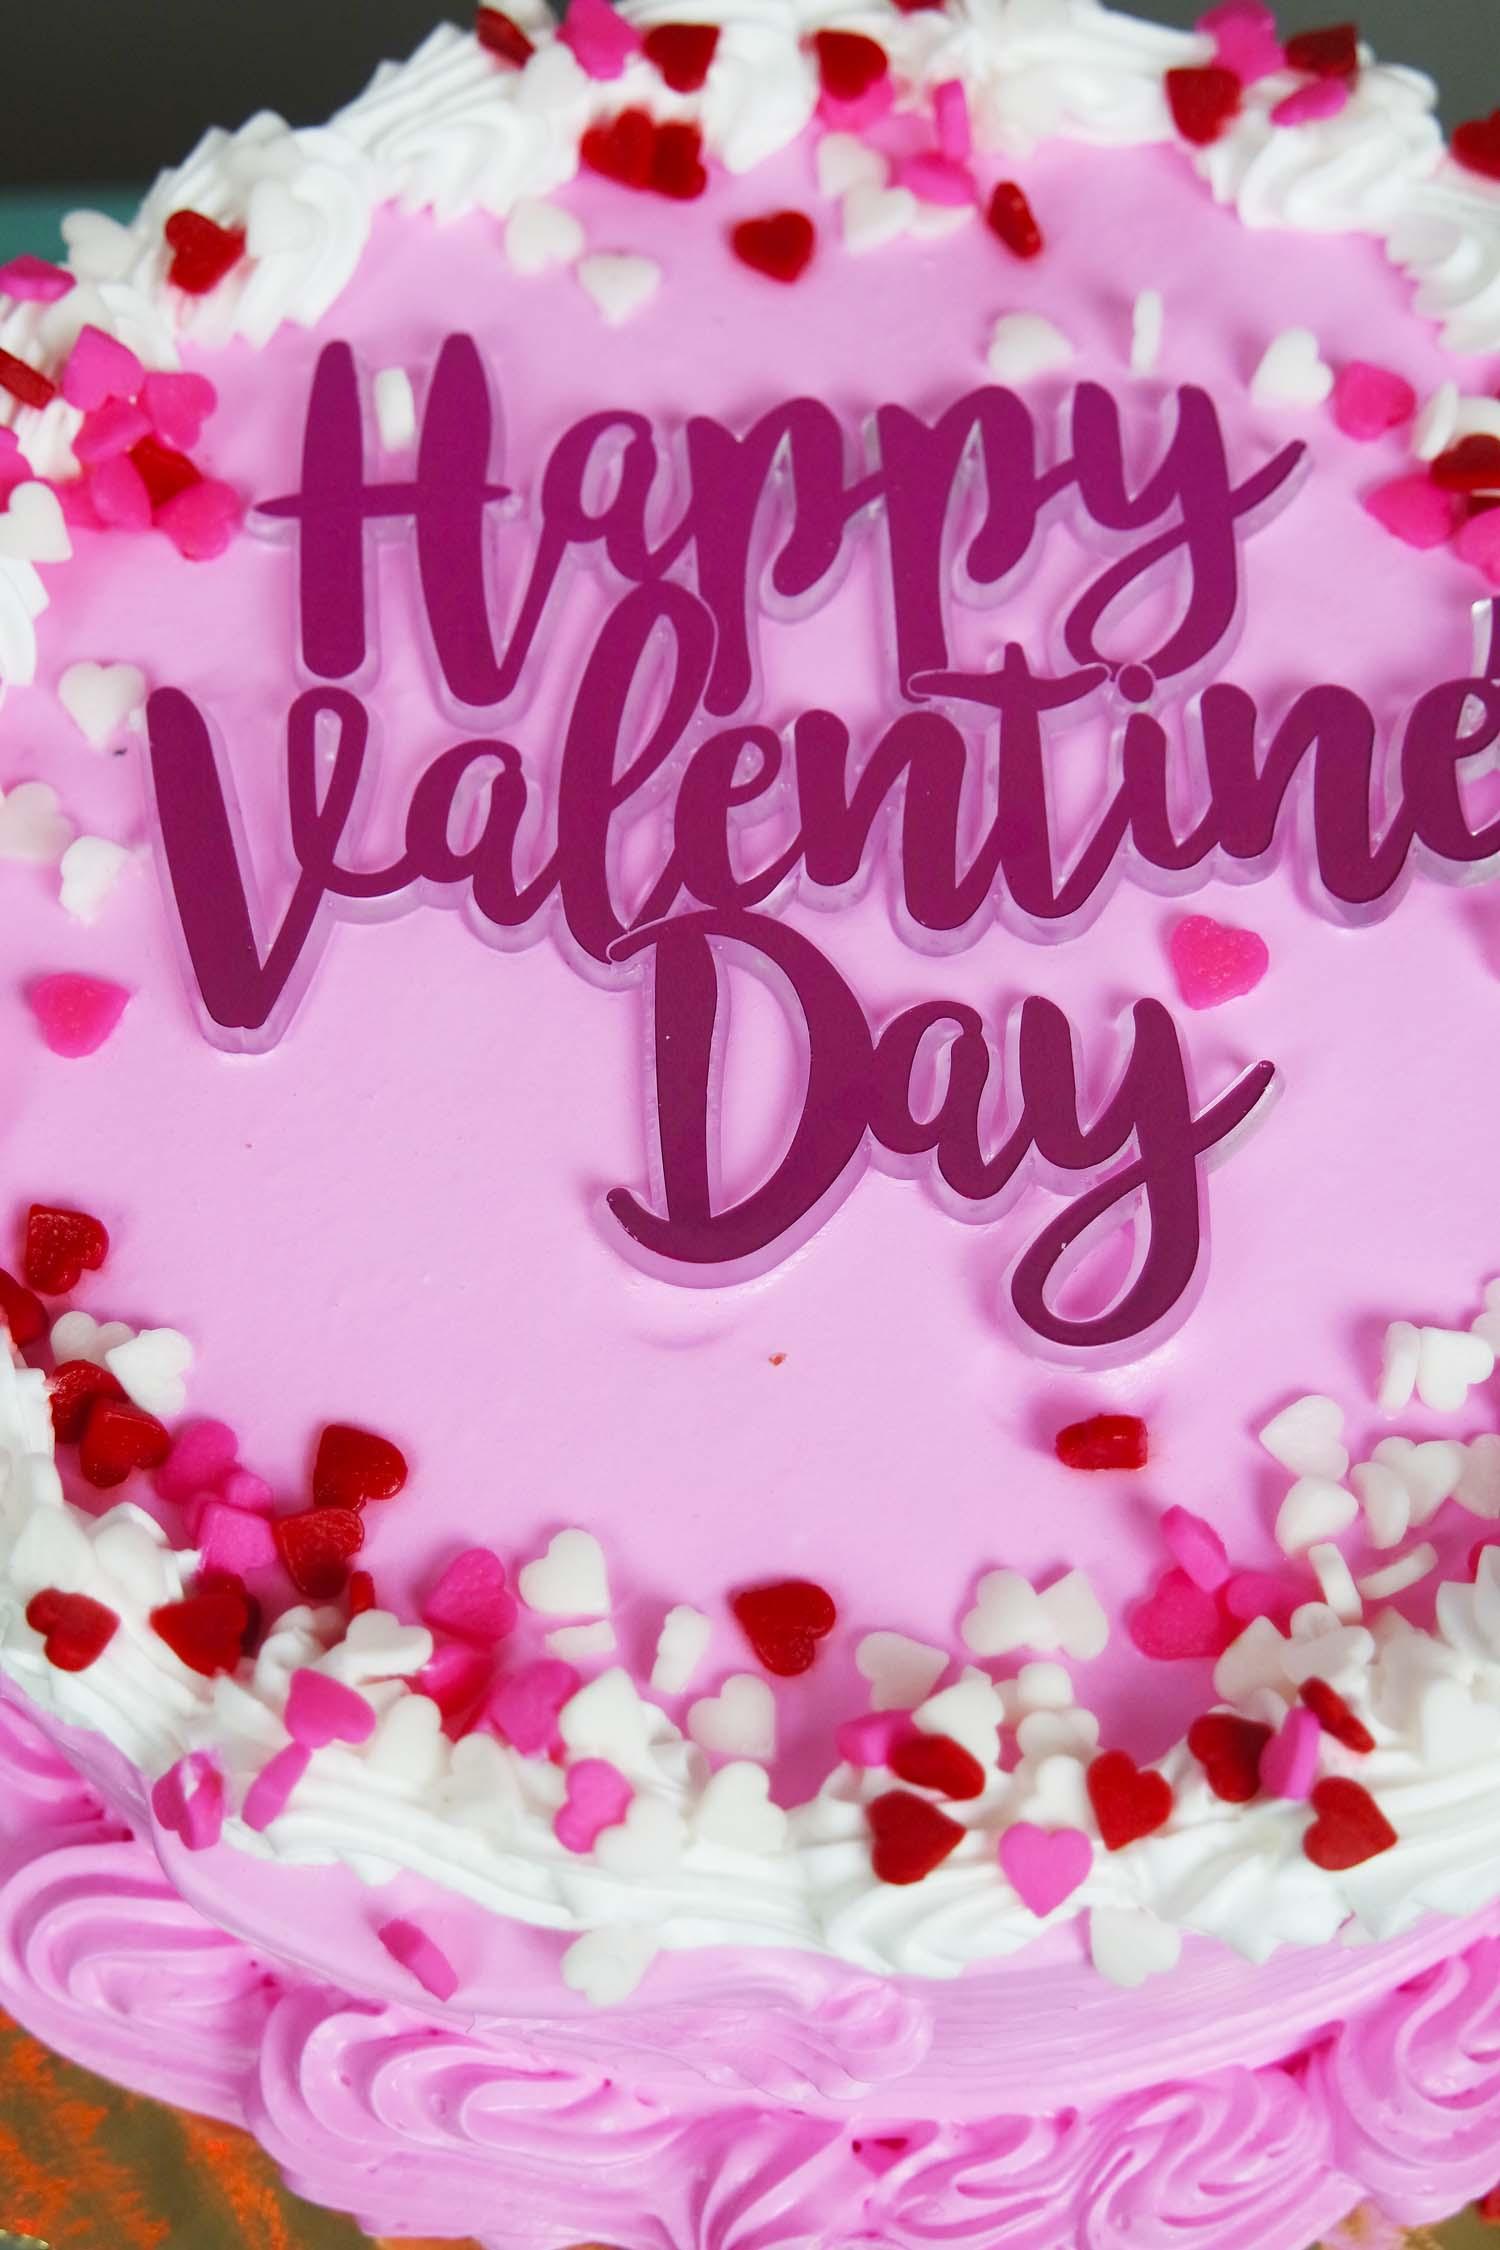 Valentines Cake NK